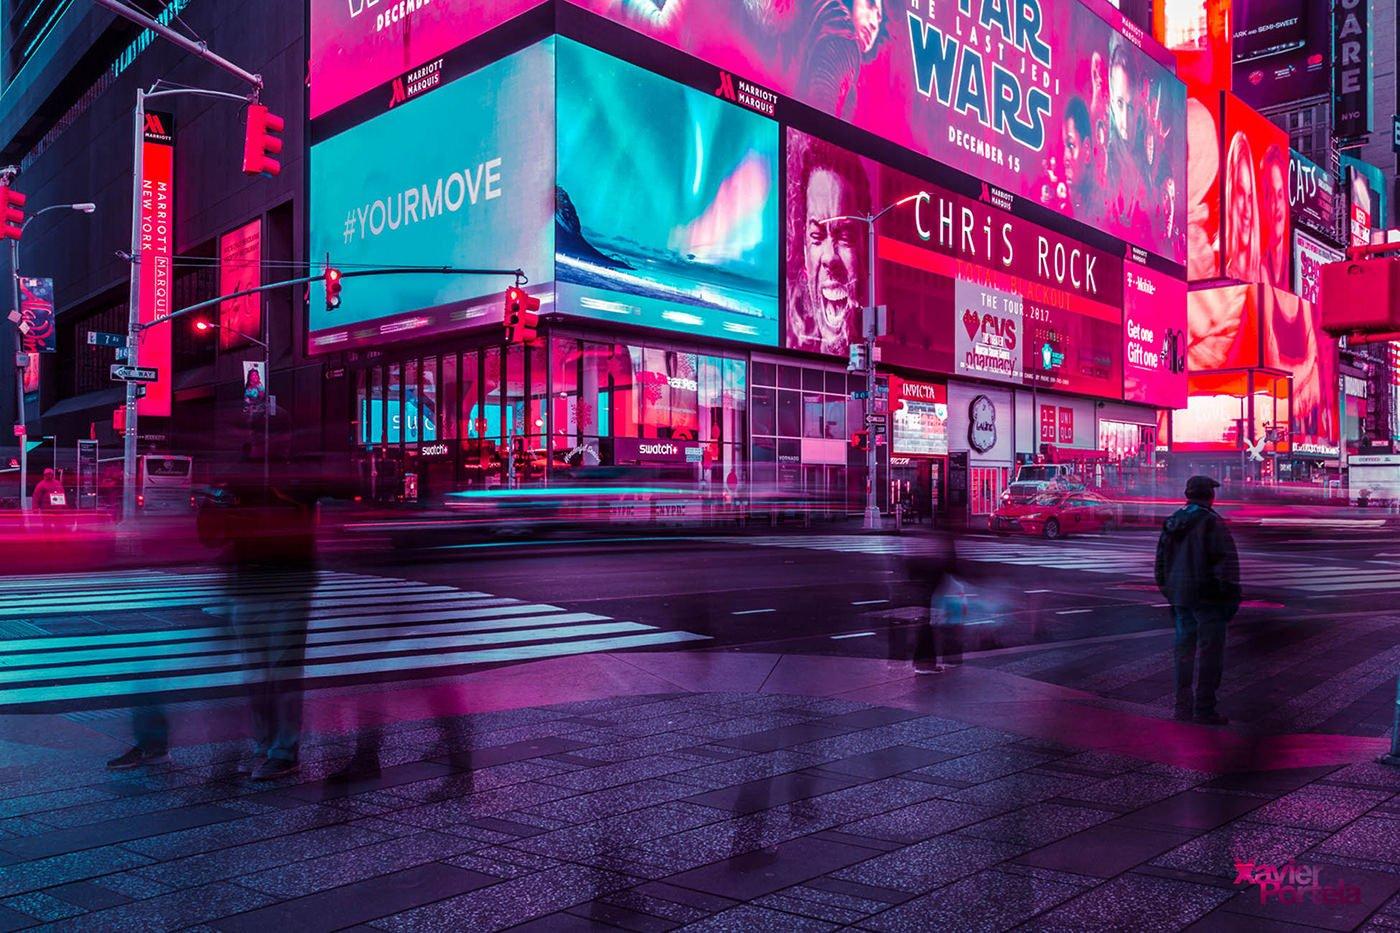 duke fotografia, xavier portela, nueva york, glow, new york, blog fotografia,